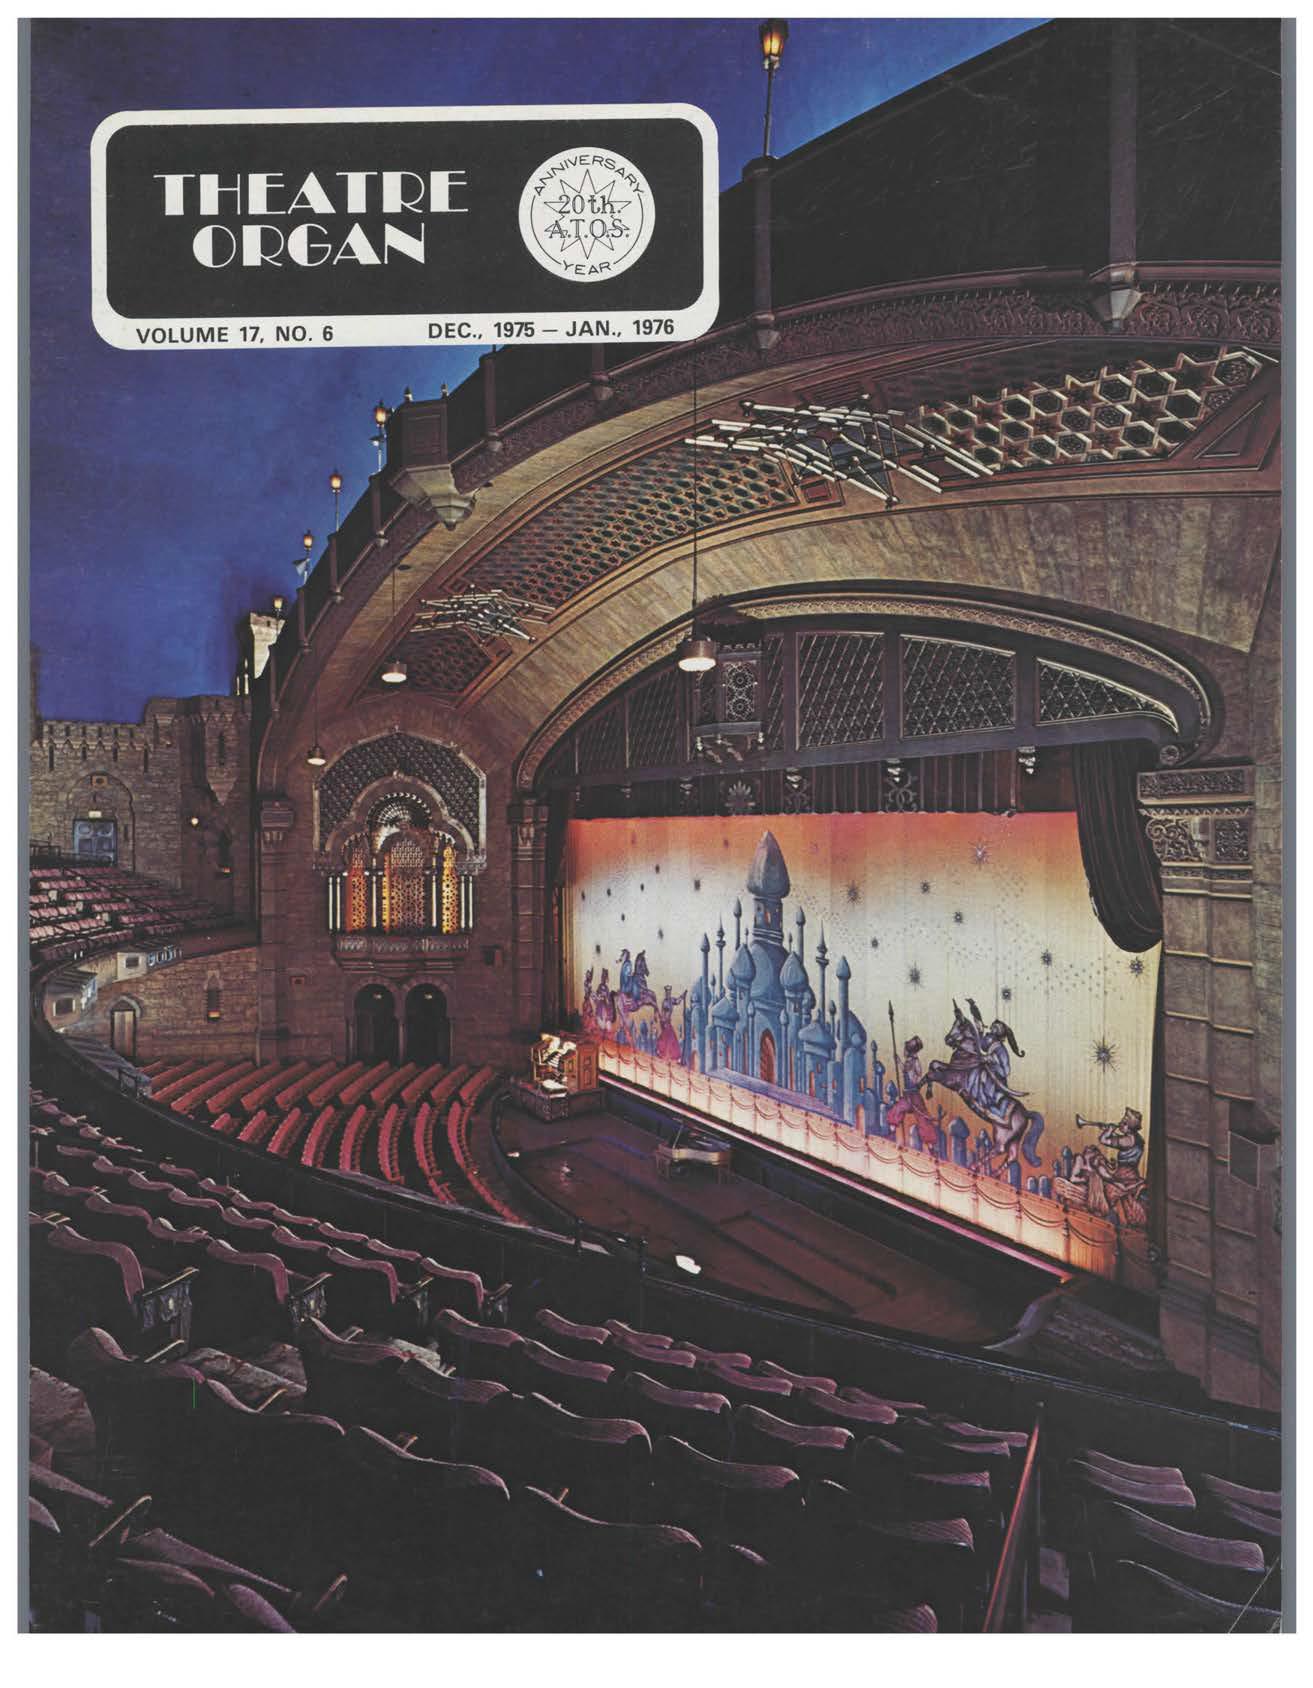 Theatre Organ, December - January 1975, Volume 17, Number 6